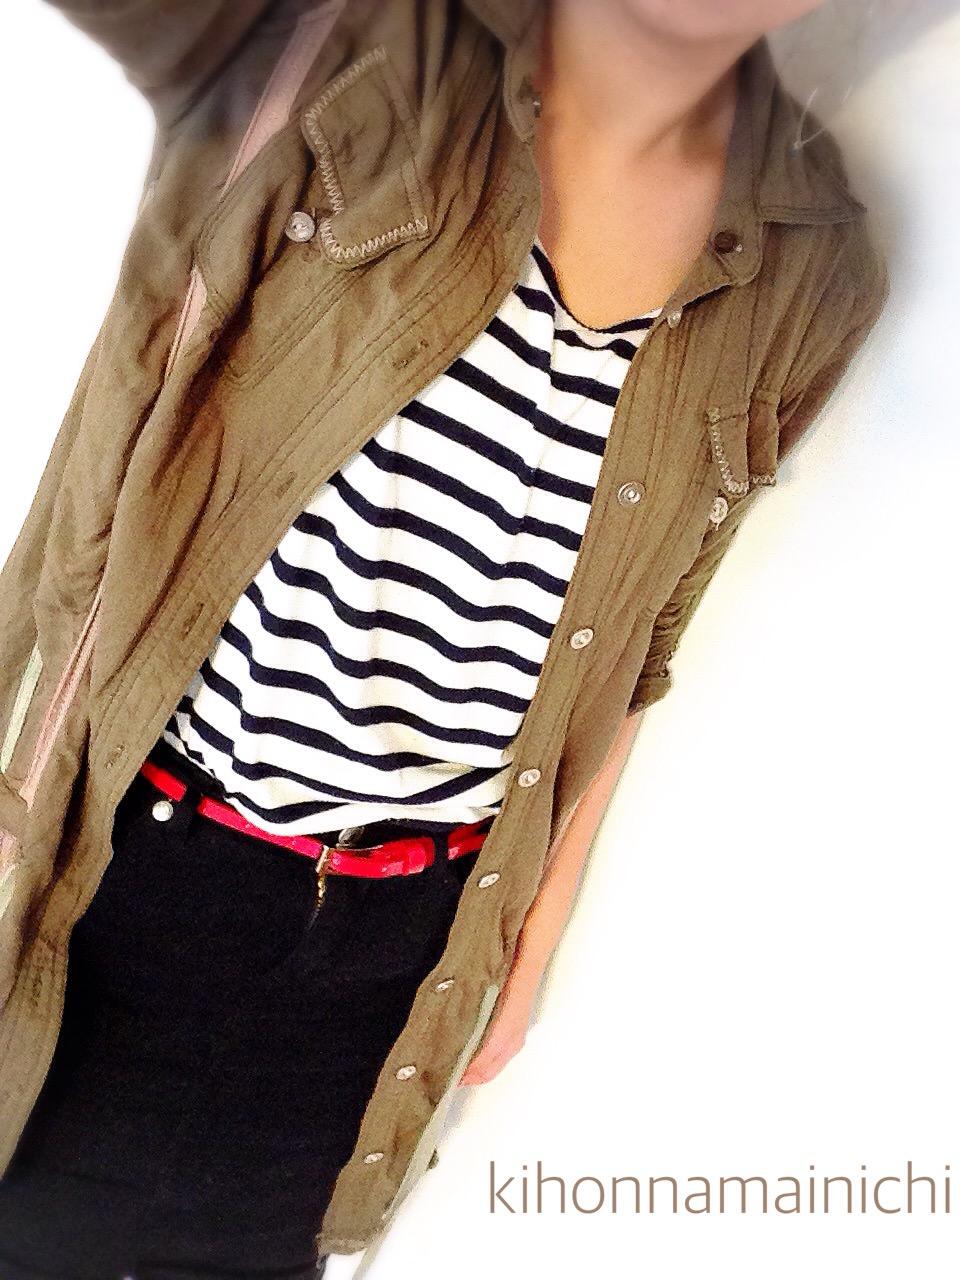 【GU スカートコーデ】ボーダーTシャツがワンランク大人っぽくなる色合わせ